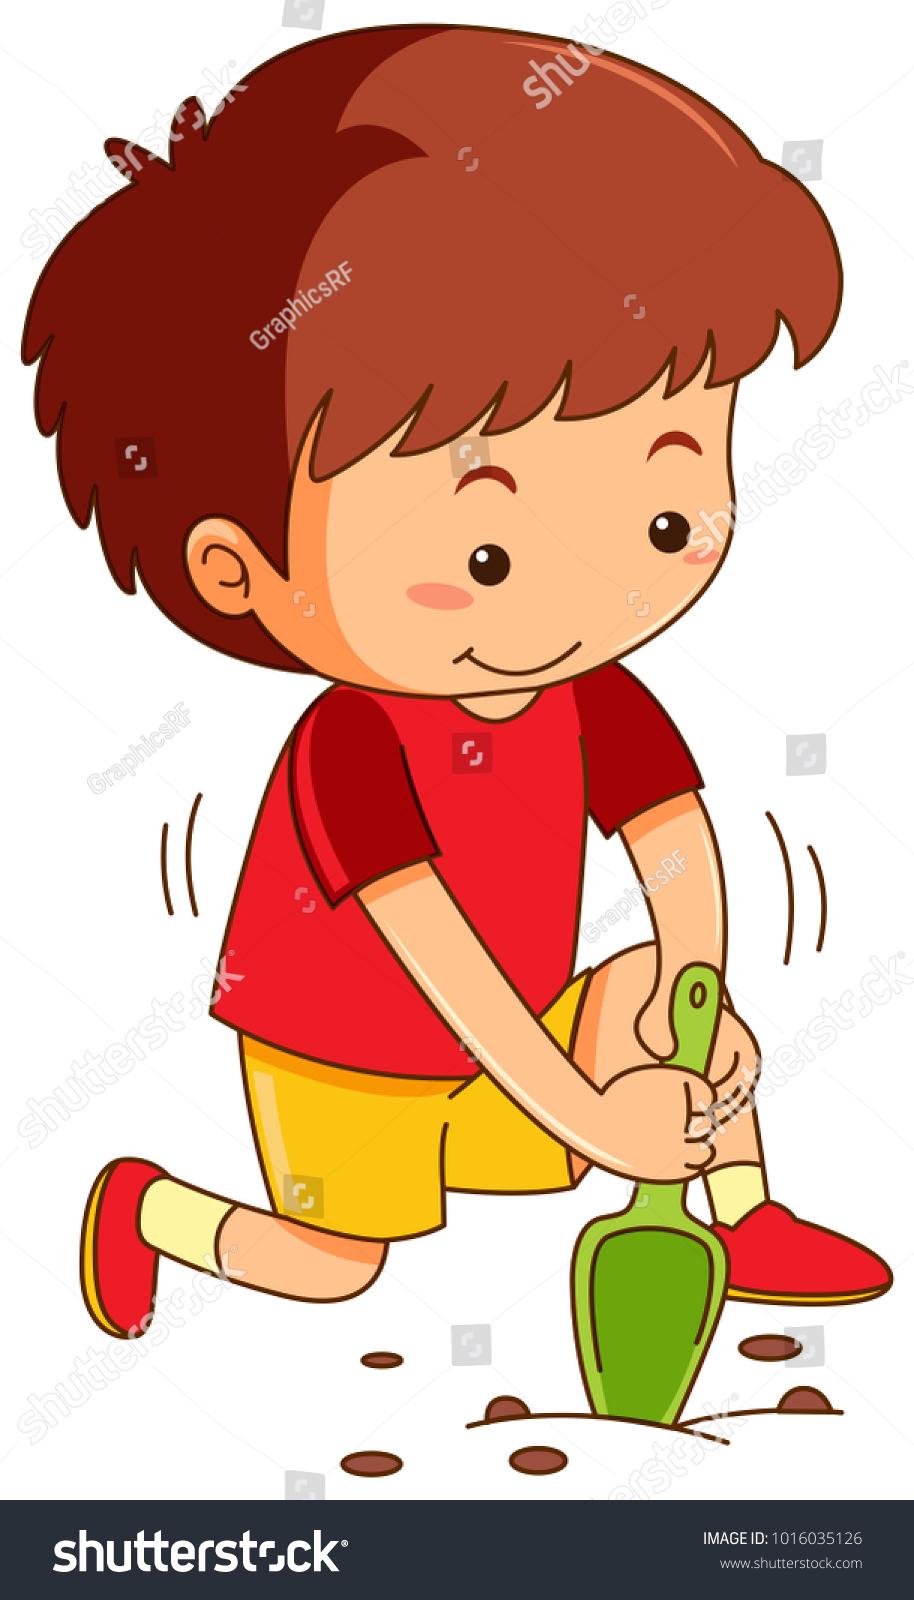 medium resolution of boy with garden spoon digging hole illustration